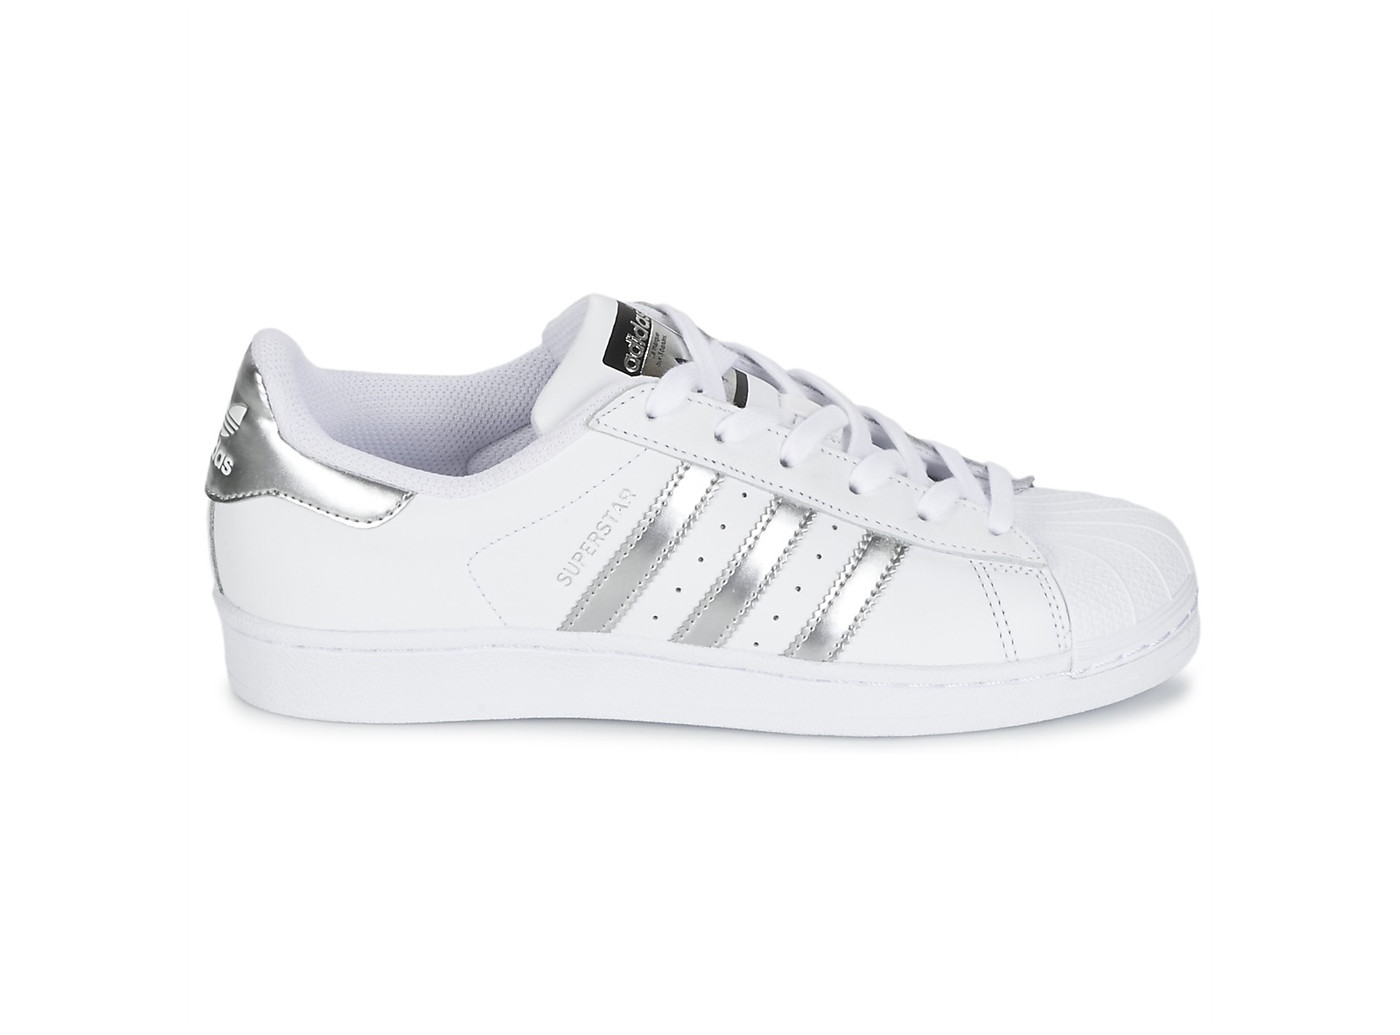 adidas Superstar Foundation AQ3091, Basket: – Style